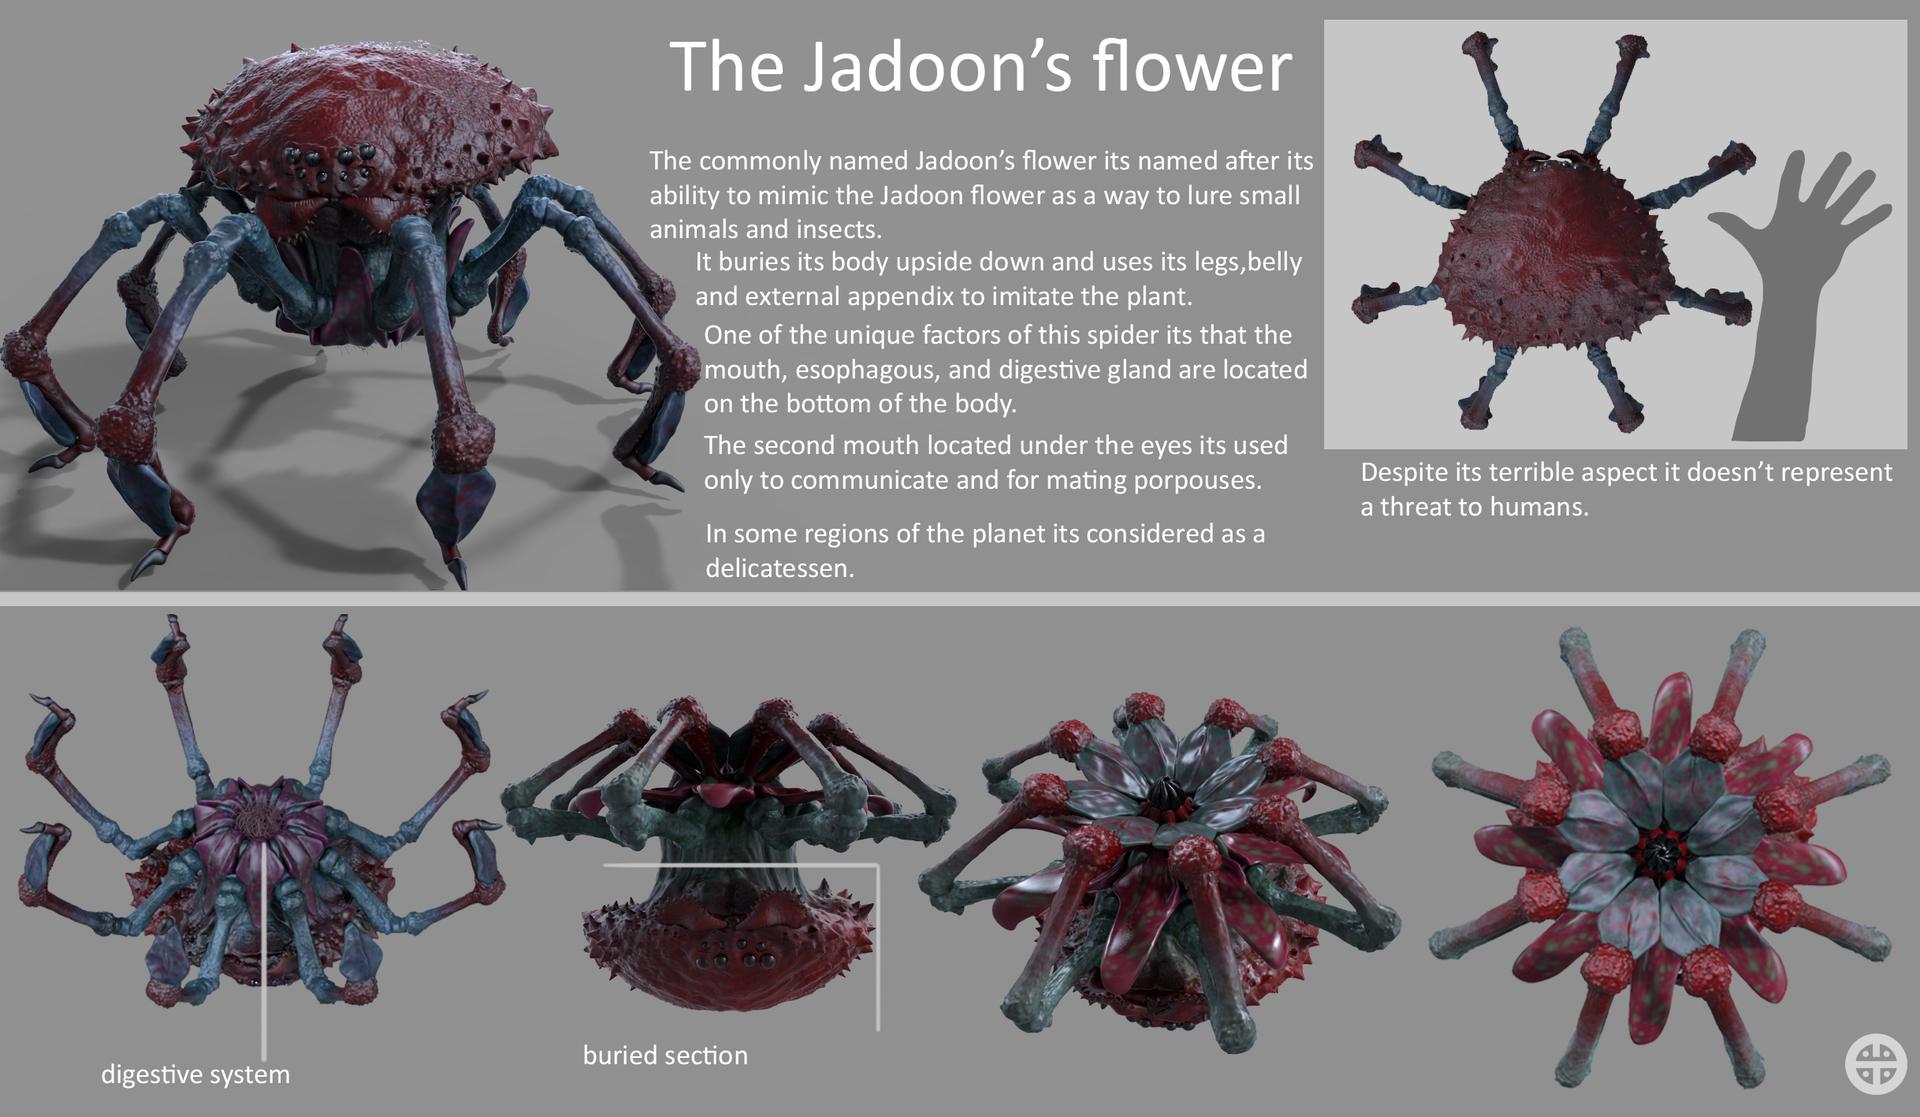 Jadoon flower